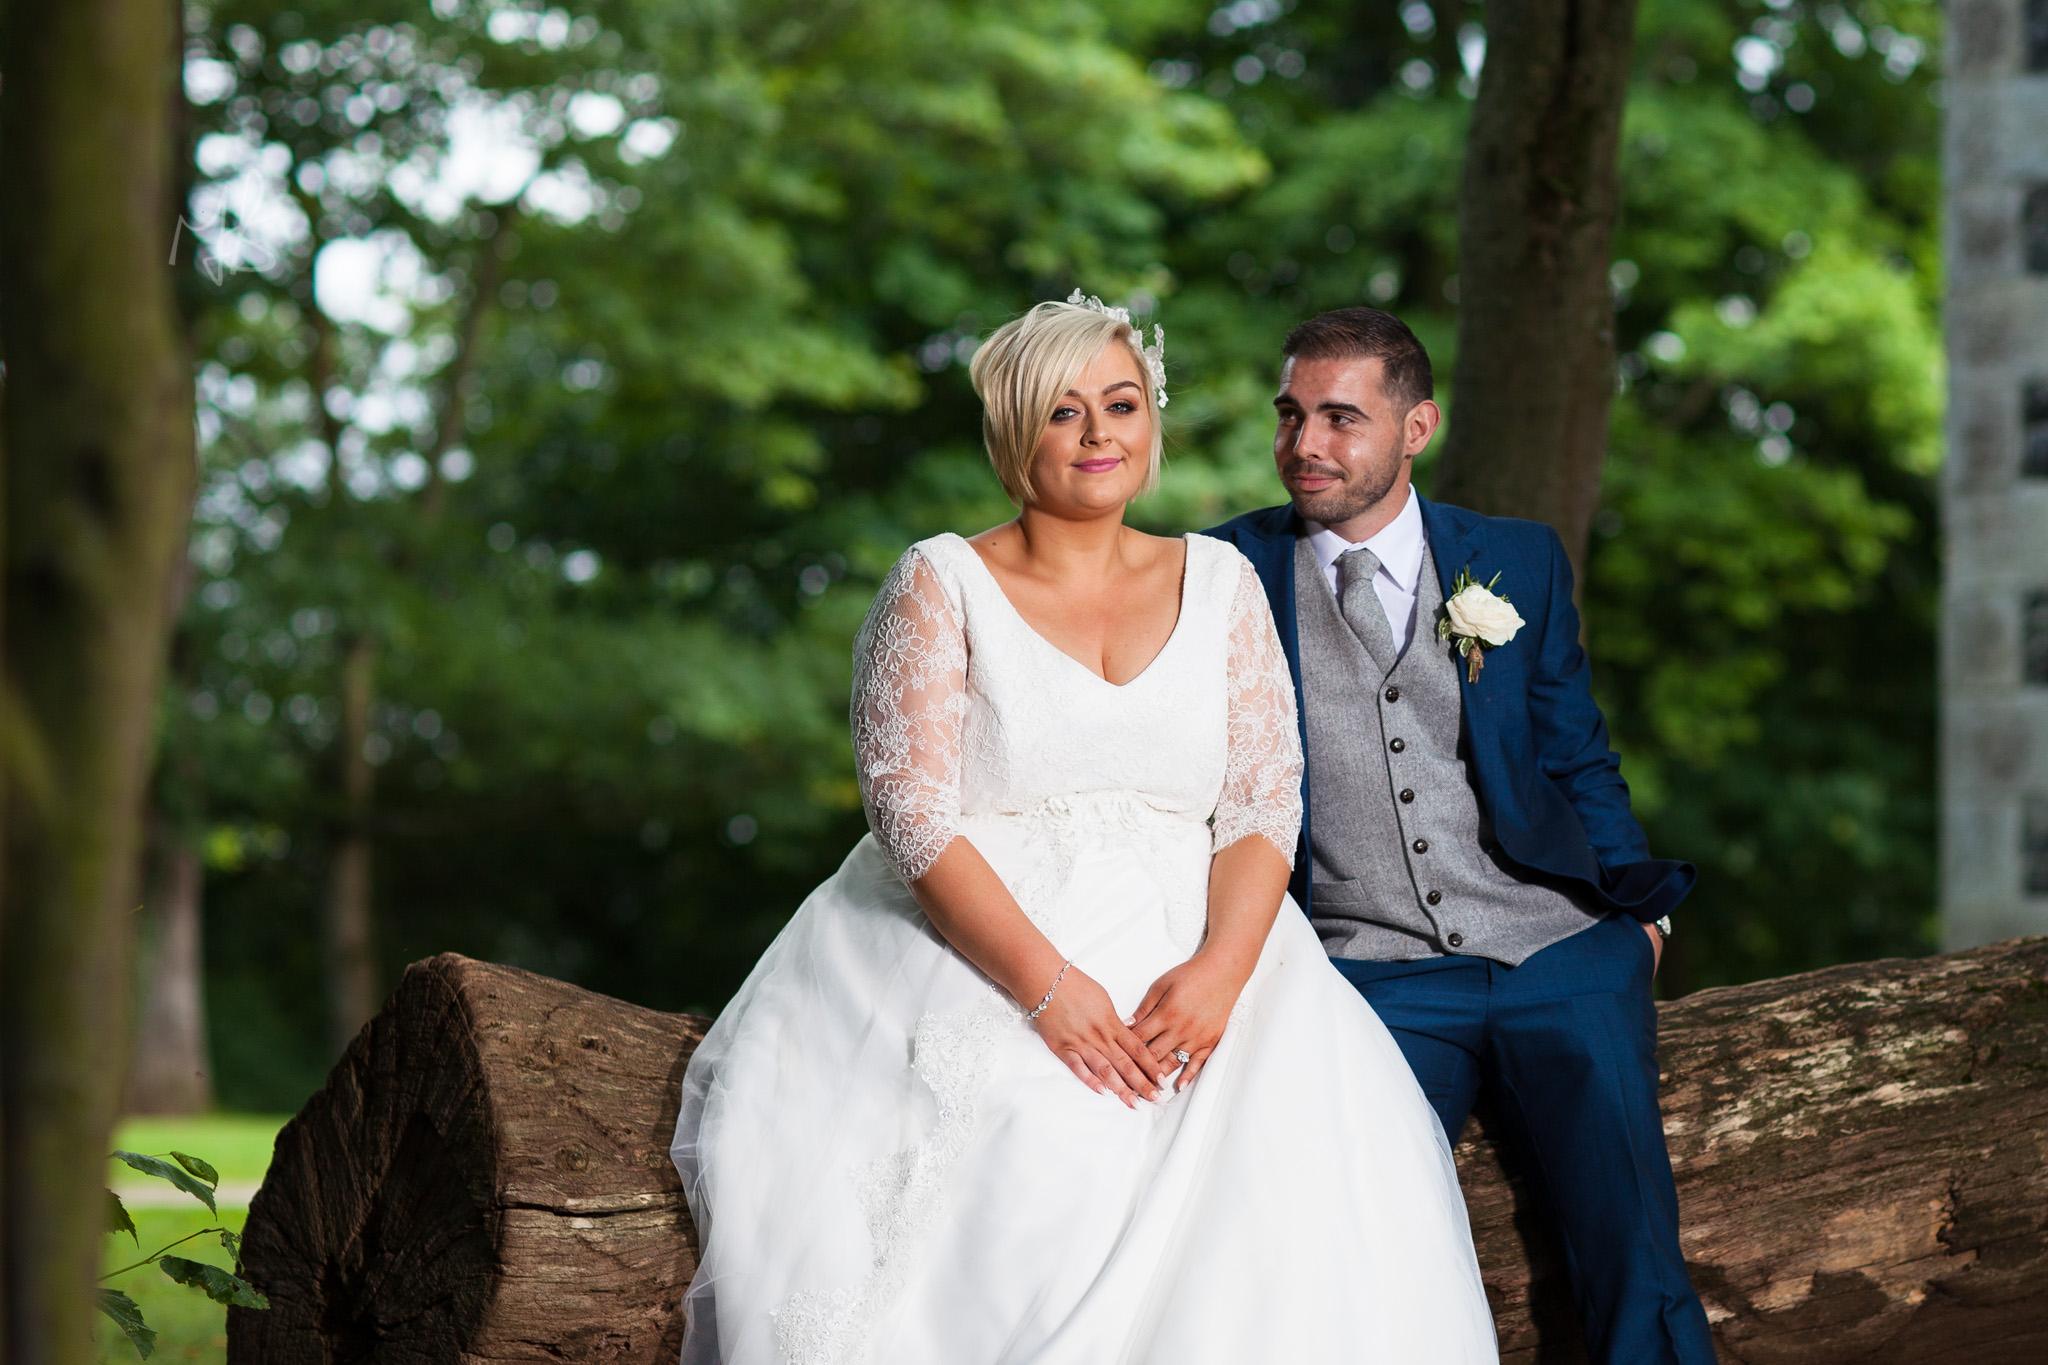 Northern-Ireland-Wedding-Photographer-Mark-Barnes-Ballymena_wedding-photography-Leighinmohr-House-Seamas_Alanna_For-web-32.jpg